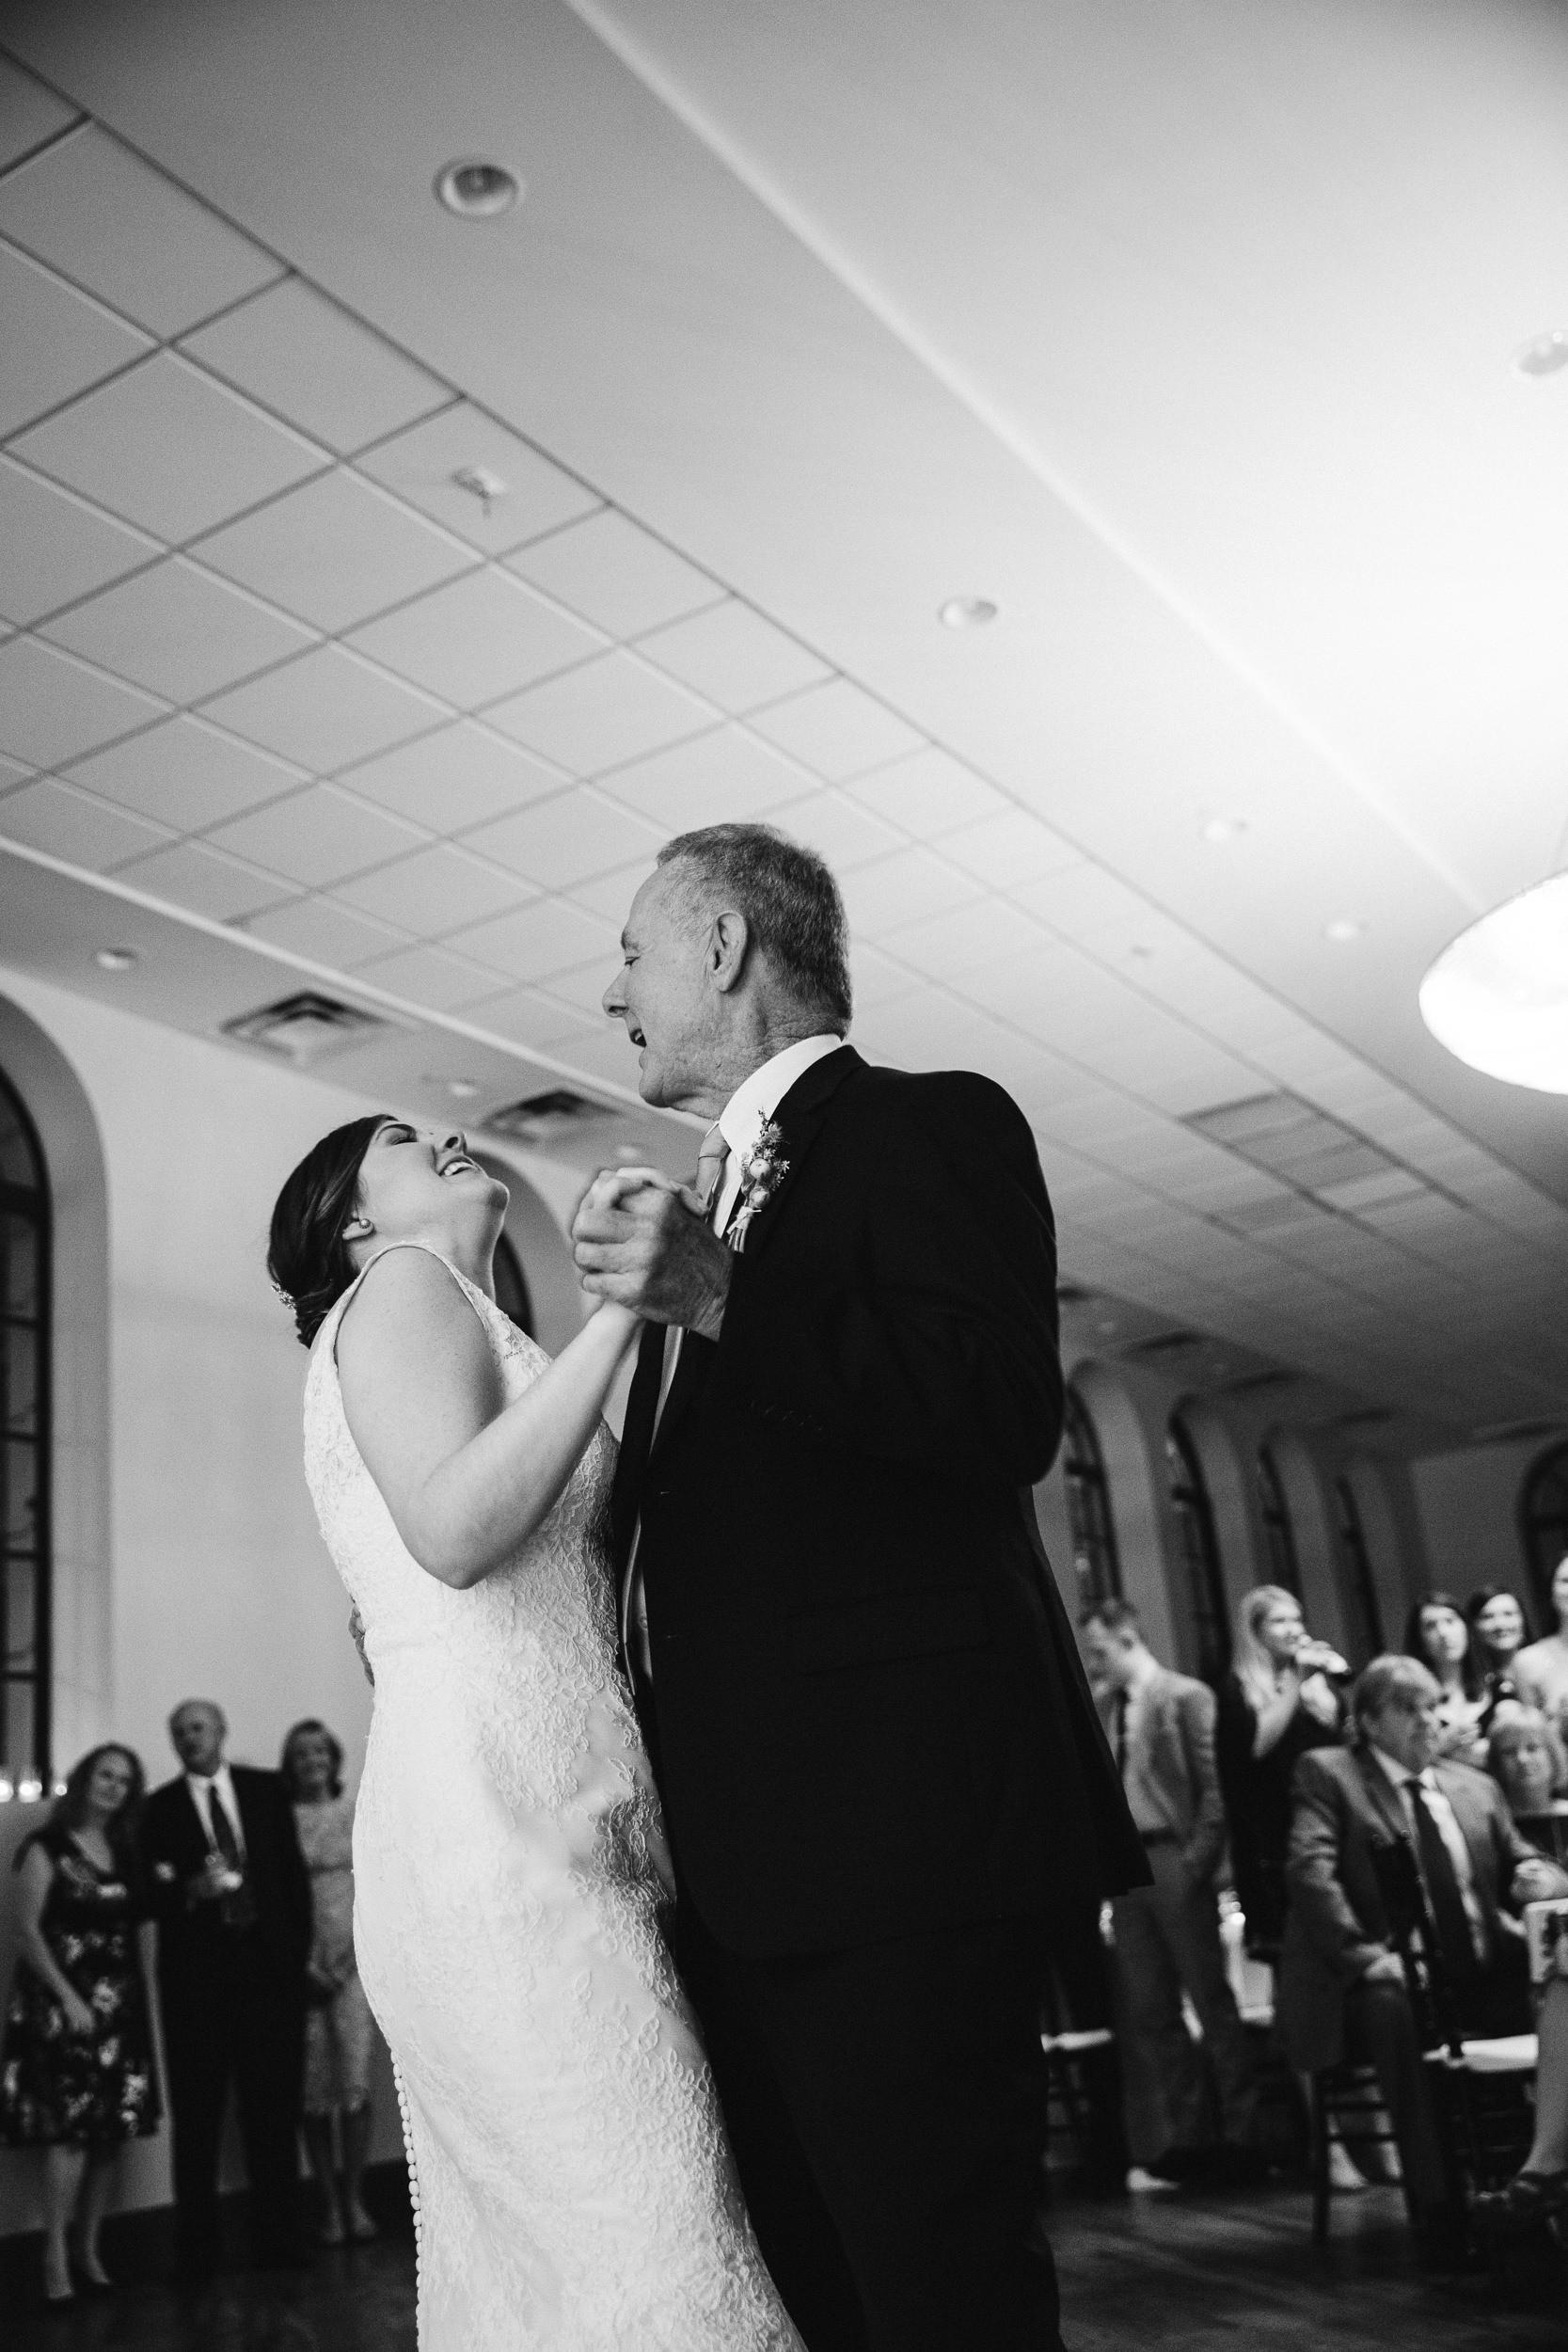 LK_Birmingham_AL_Wedding_2019-00055.jpg